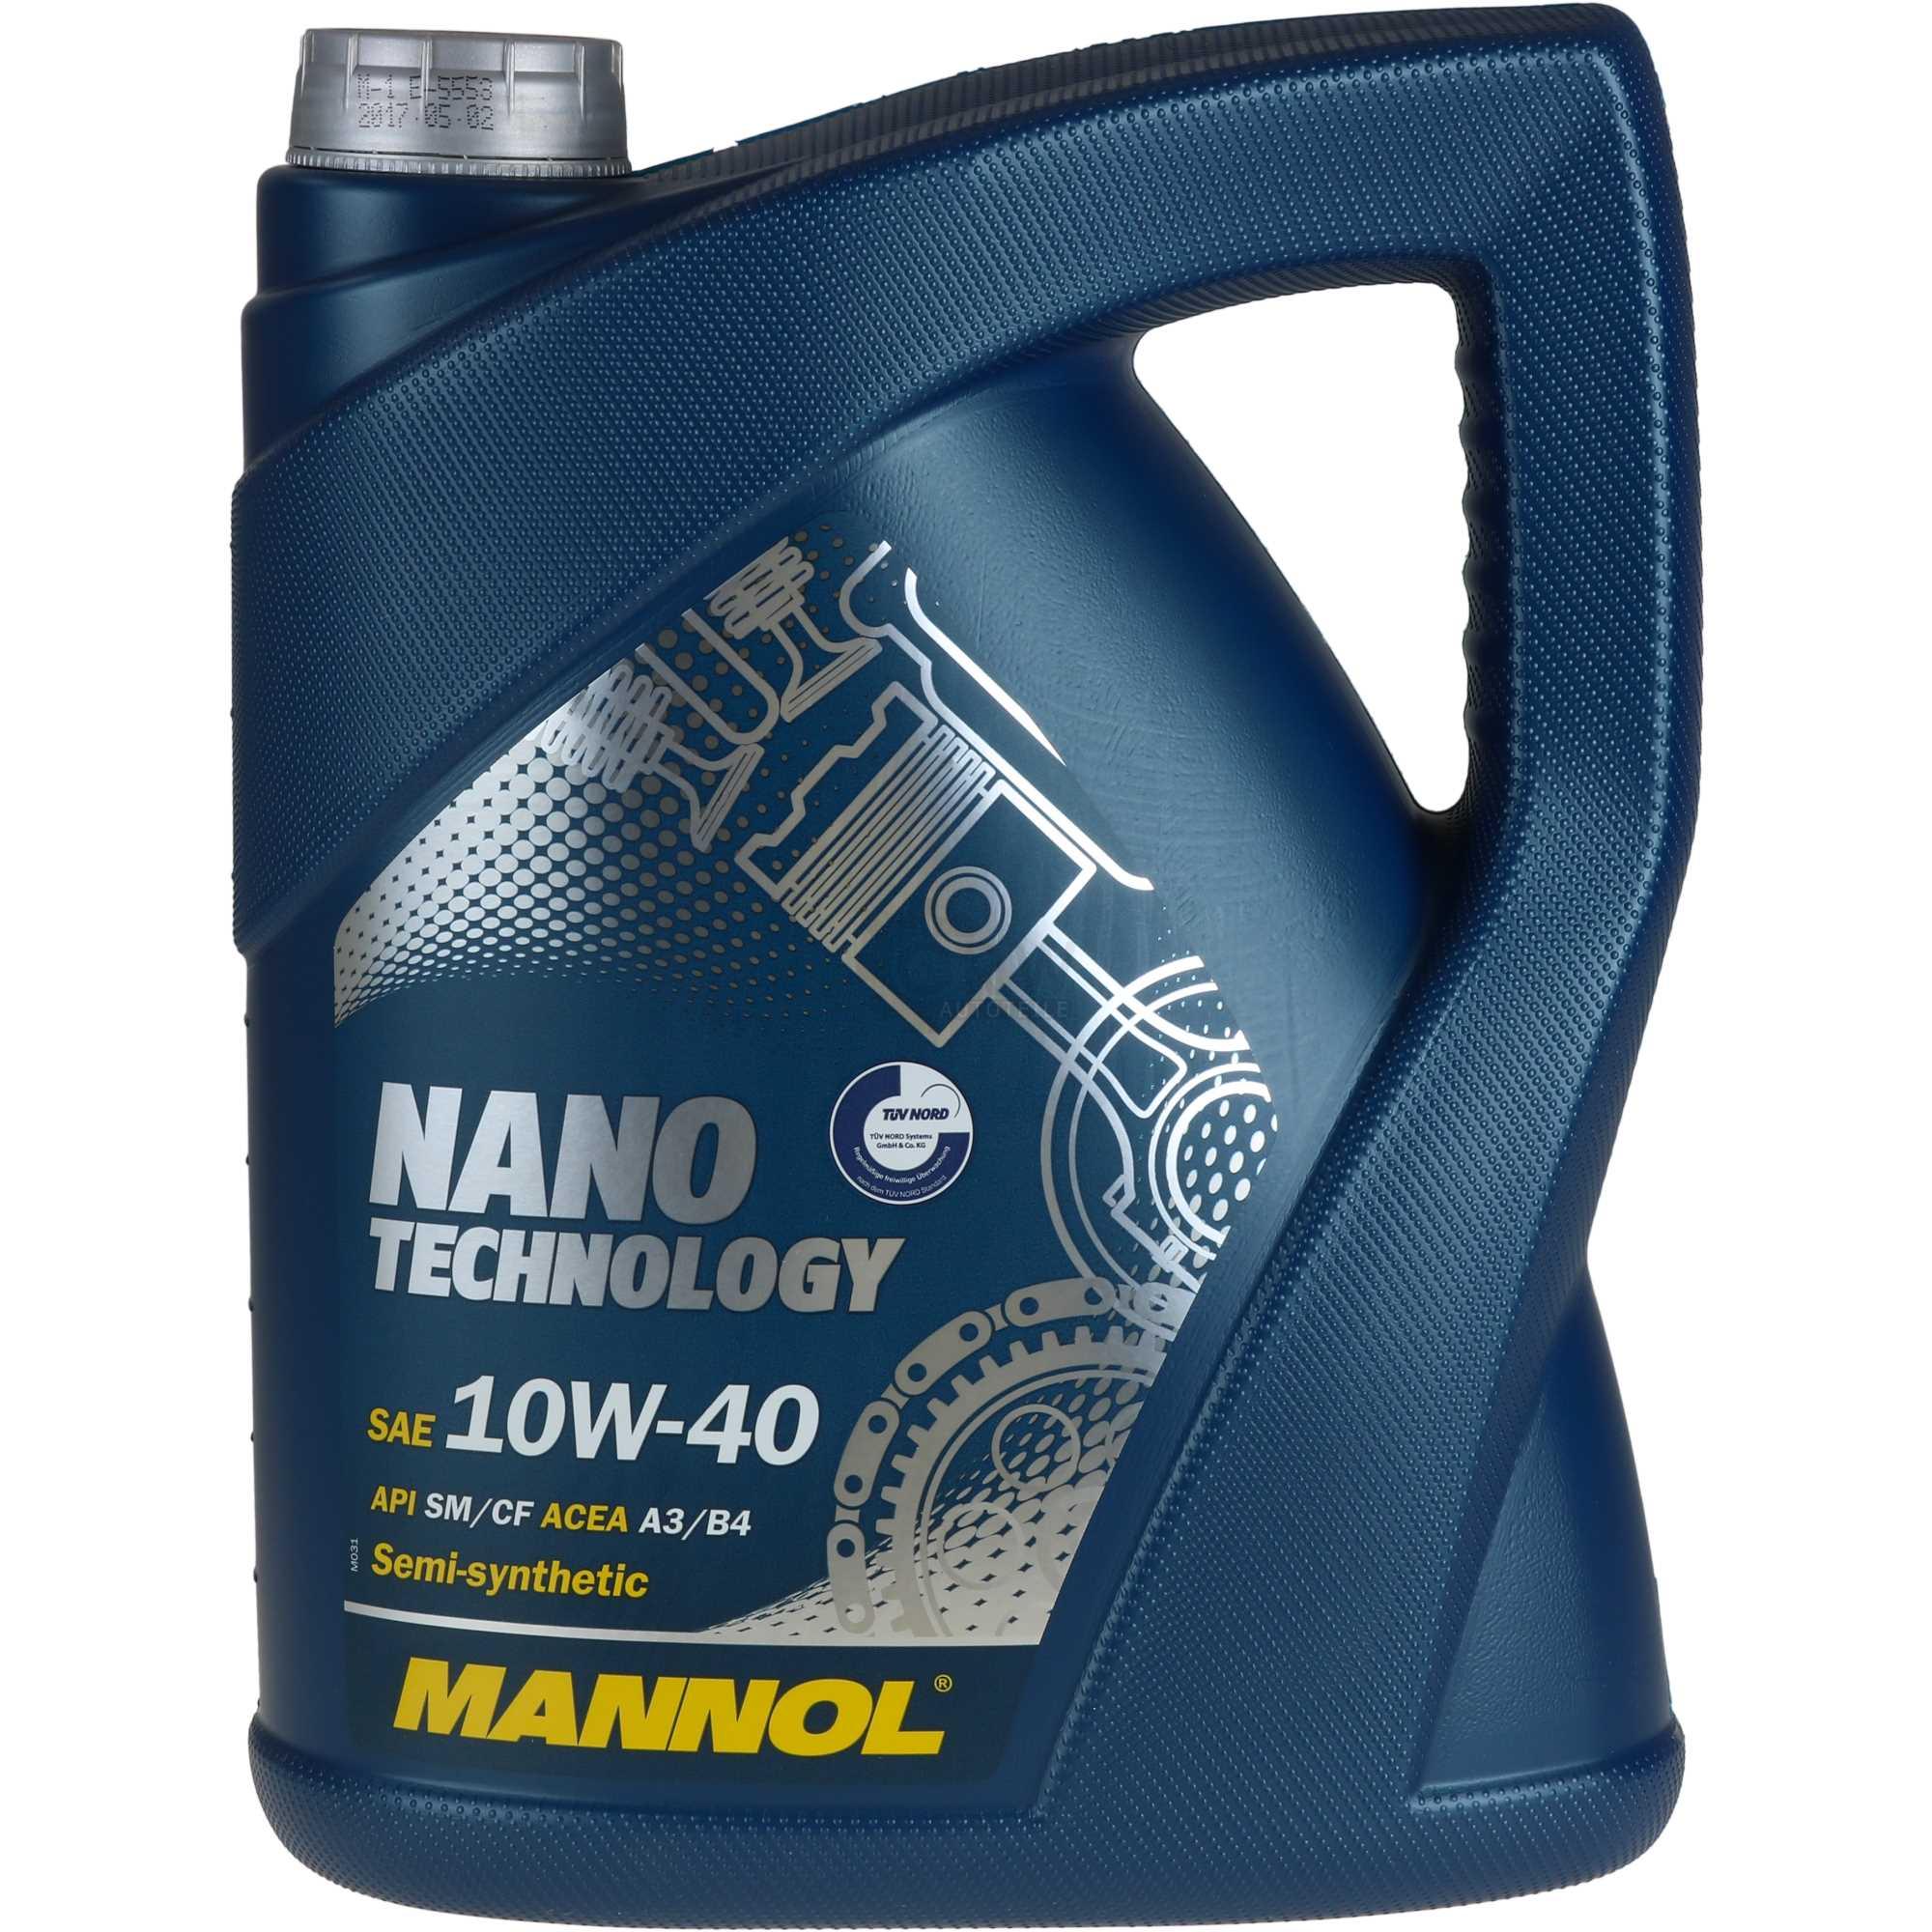 Aceite-del-motor-aceite-5w40-10w40-15w40-5w30-10w60-1l-4l-5l-7l-10l-20l miniatura 61